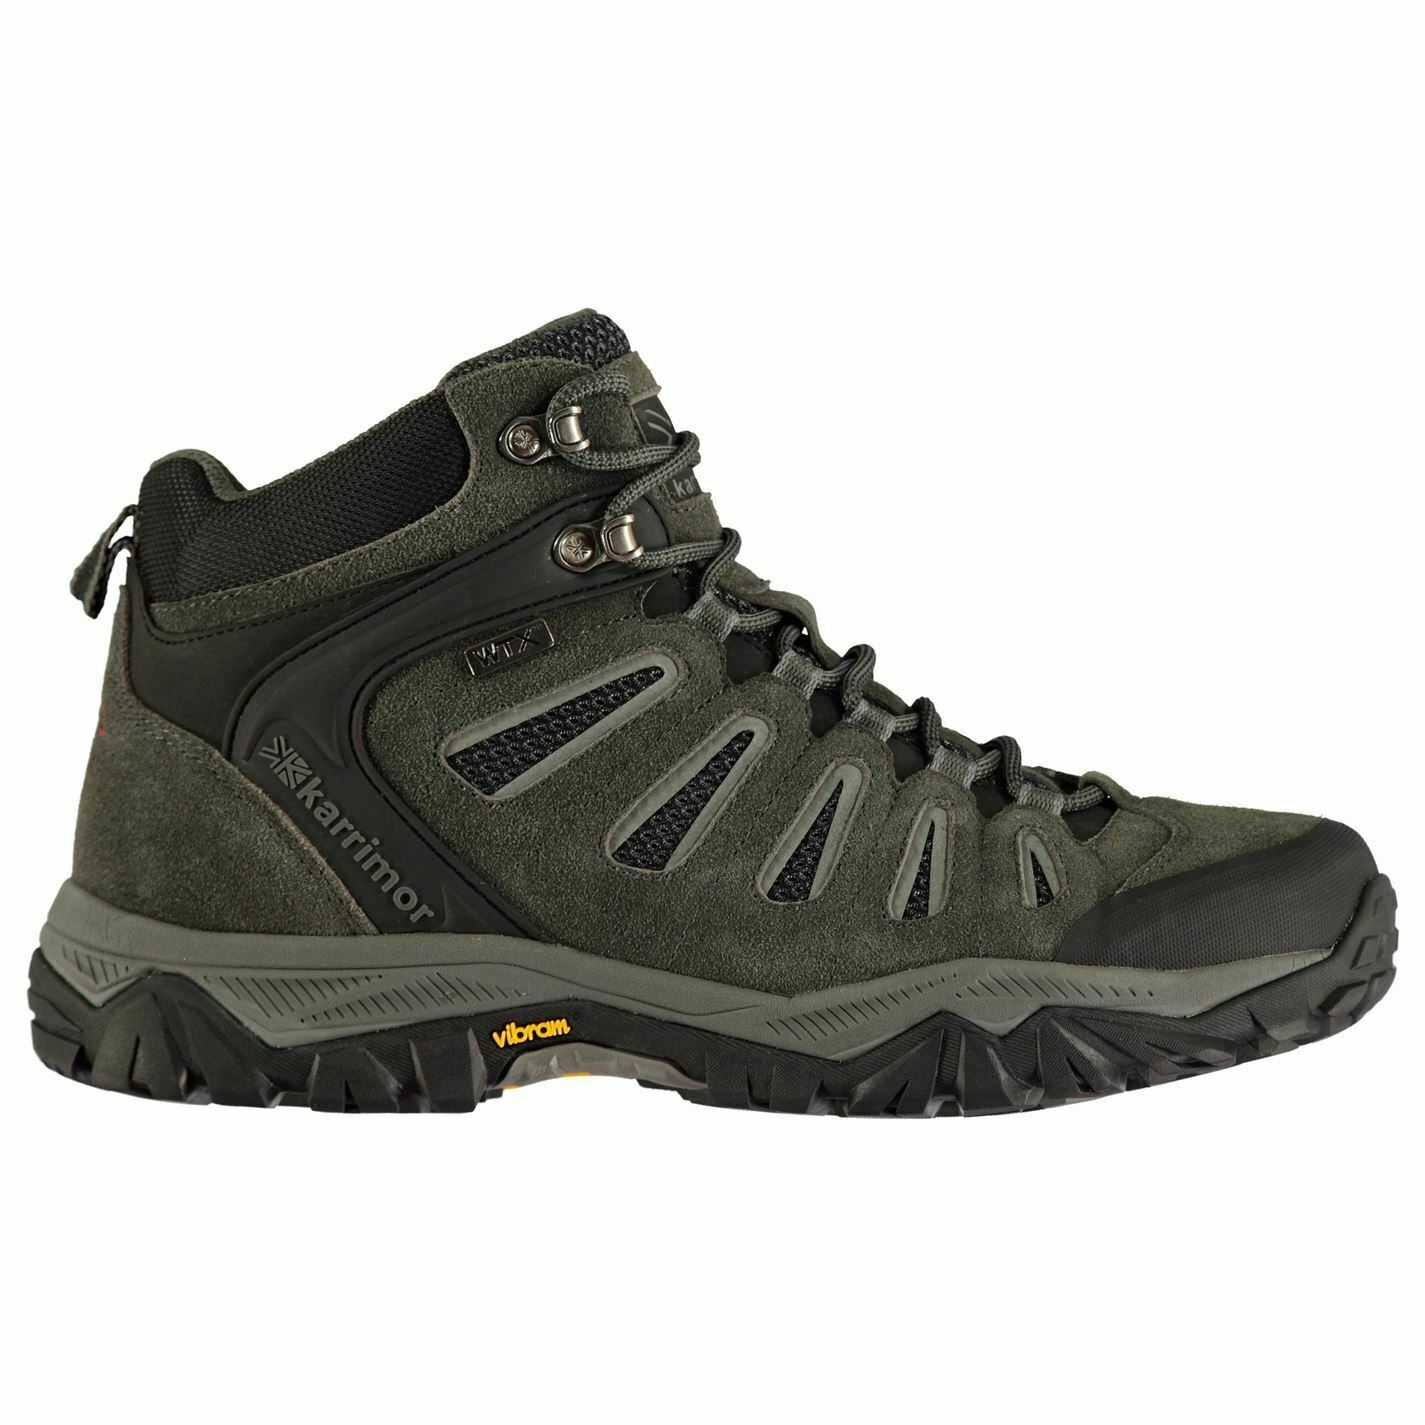 Karrimor Wildcat a mediados señores  botas negro wanderm zapatos  compras en linea